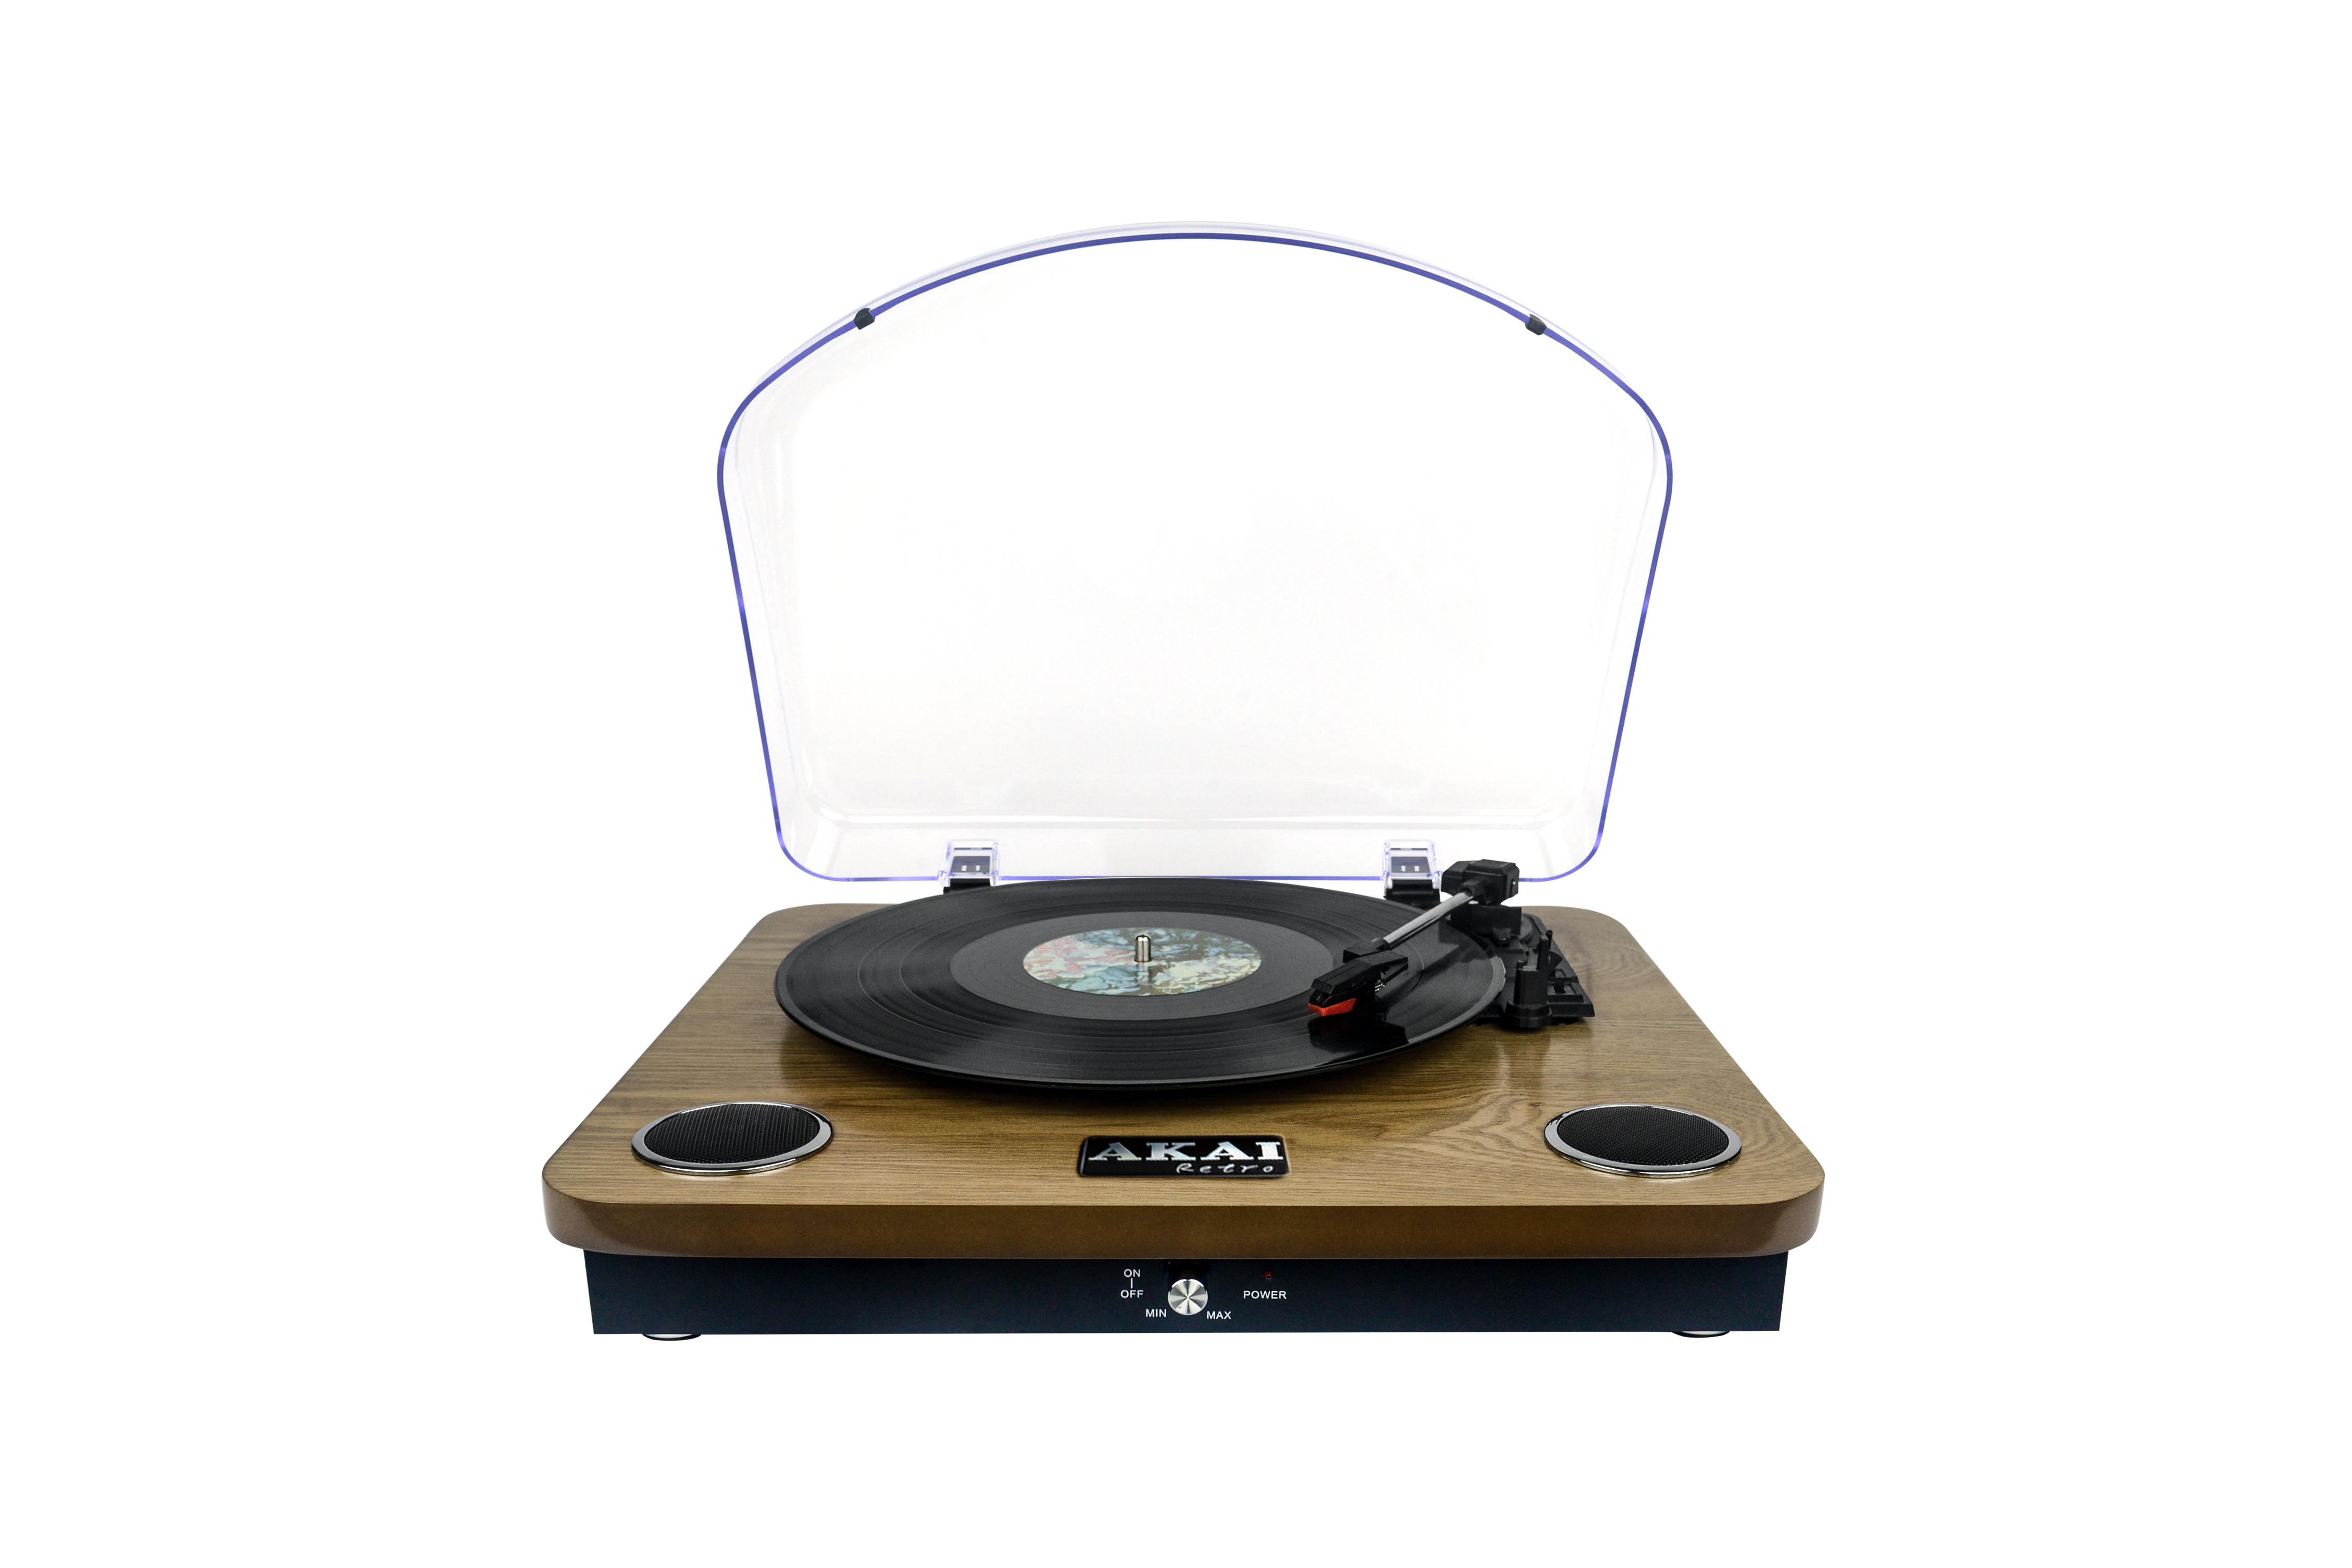 akai tourne disque retro bois bluetooth usb pas cher achat vente platines vinyle. Black Bedroom Furniture Sets. Home Design Ideas